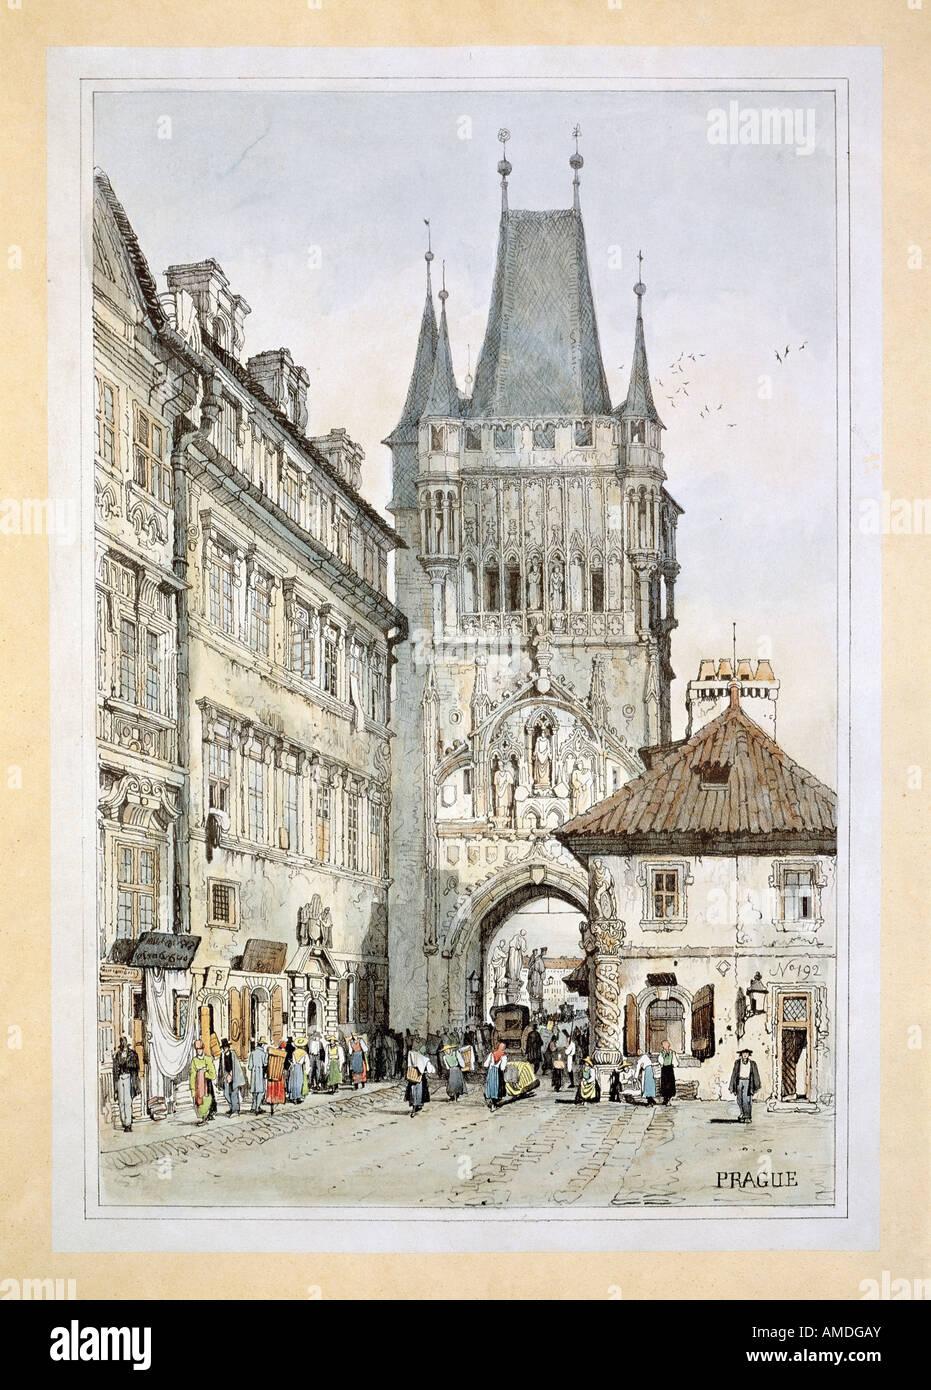 fine arts, Morstadt, Vinzenz (1802 - 1875), views of Prague: Tower of Charles Bridge, colour lithograph, 19th century, Stock Photo